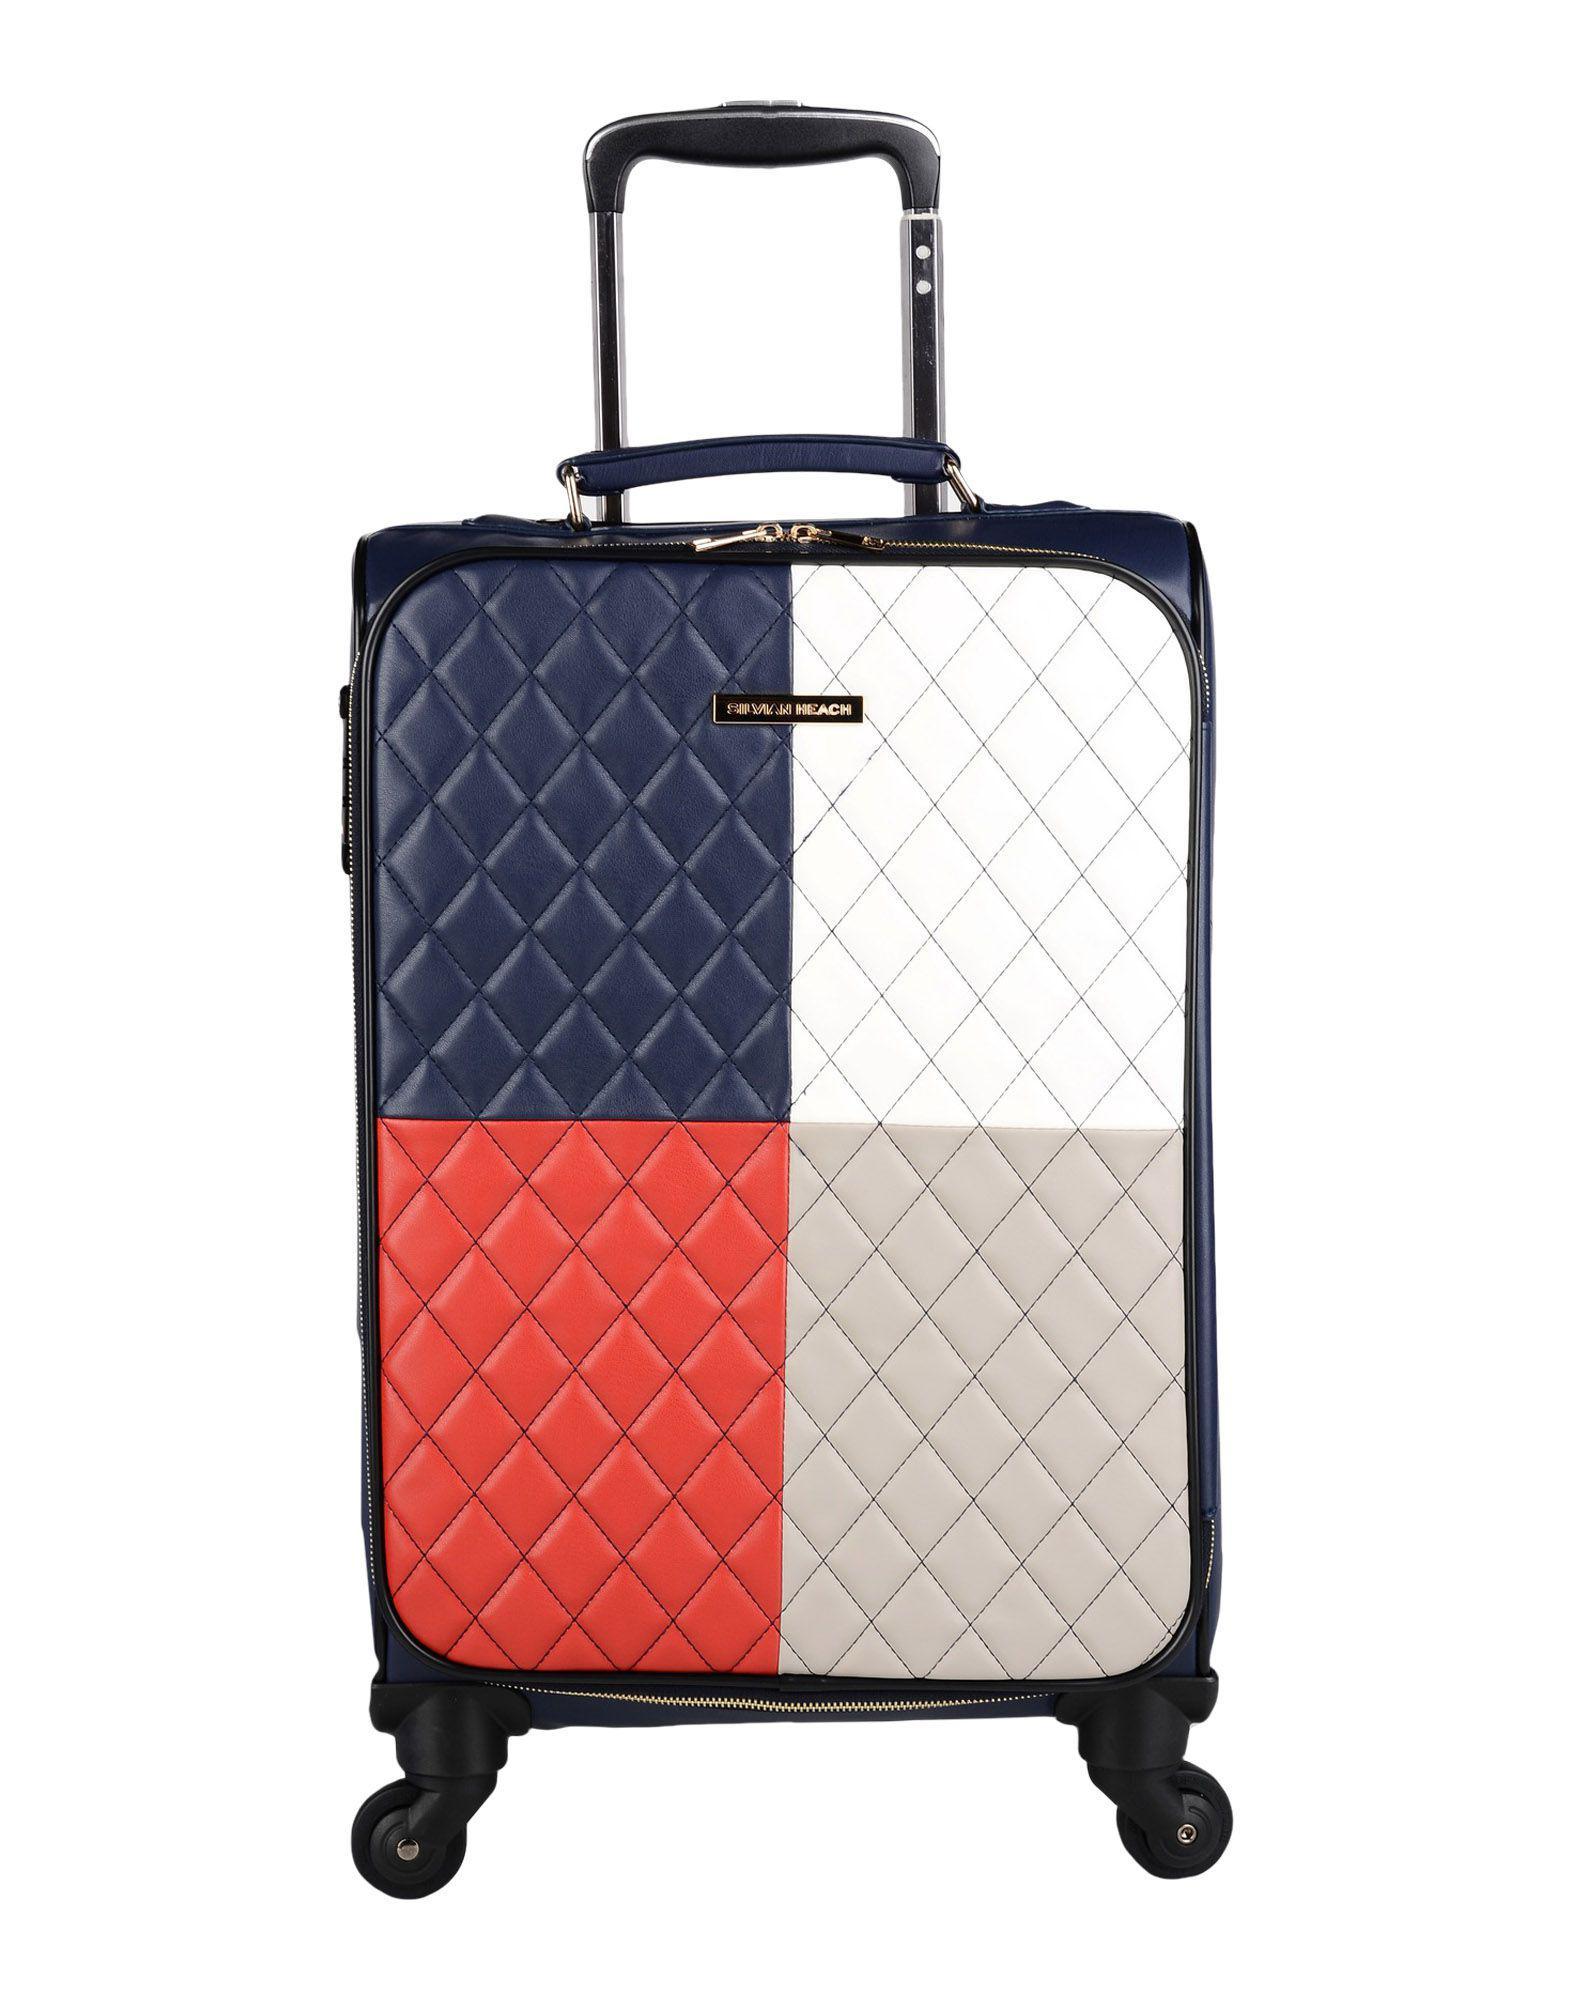 LUGGAGE - Wheeled luggage Silvian Heach rLJOyI5zs